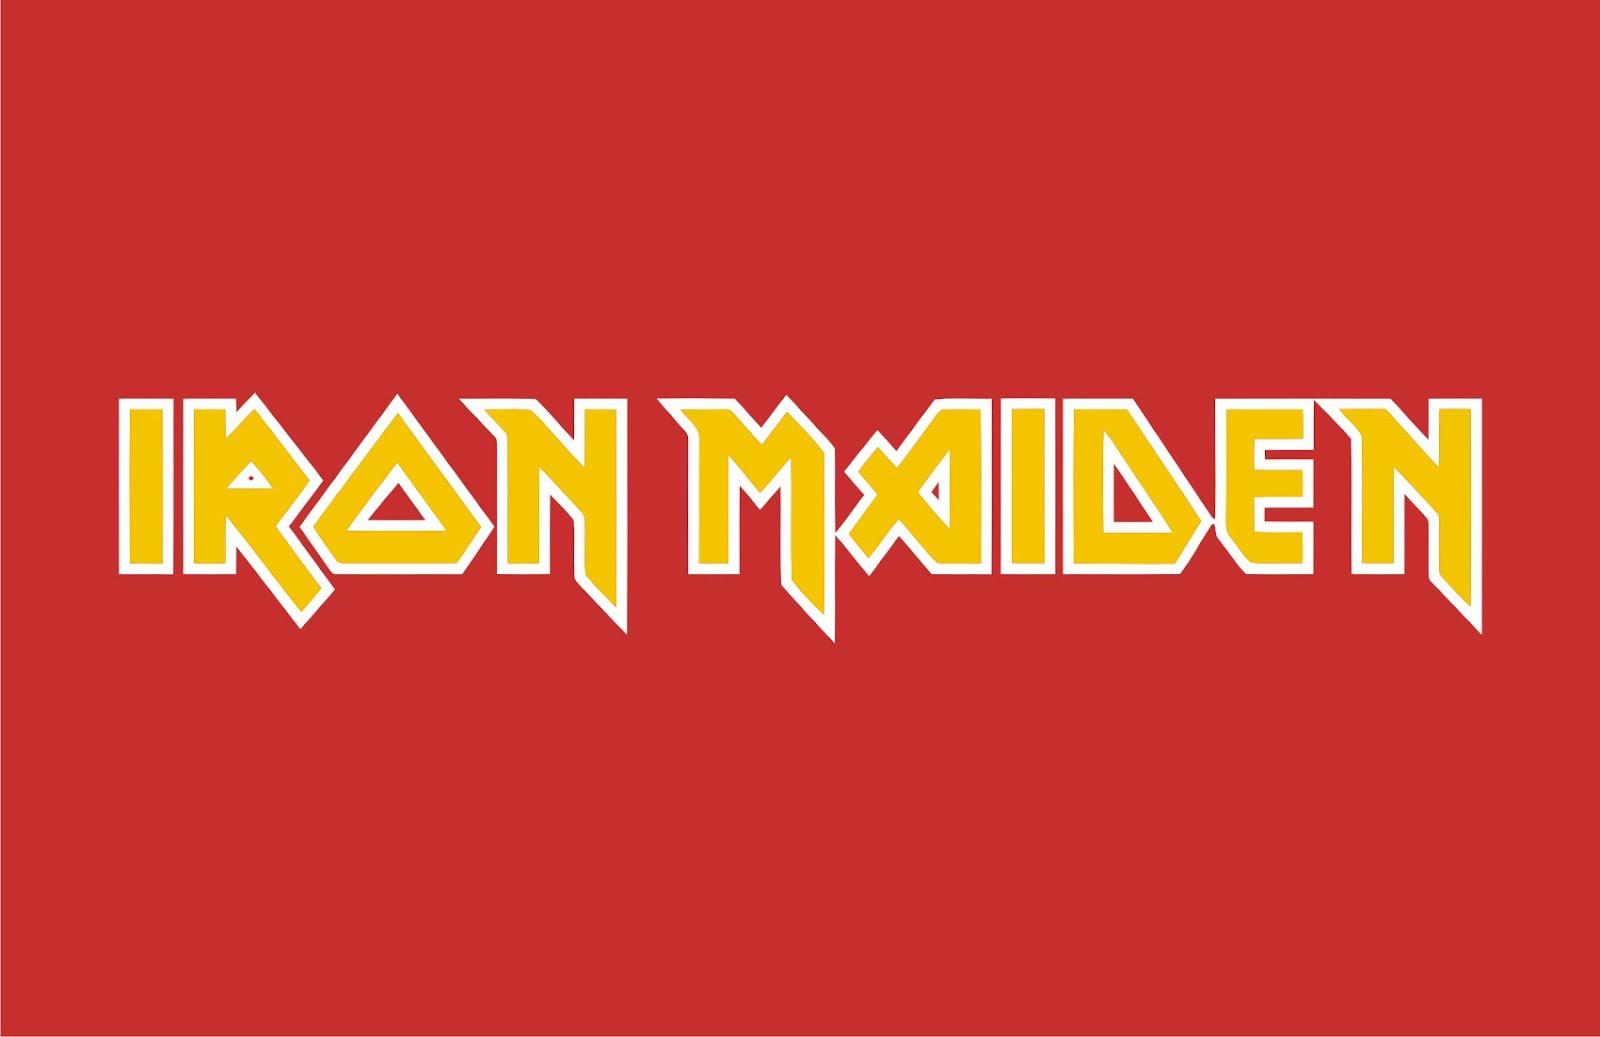 iron_maiden-eddy_back_vector